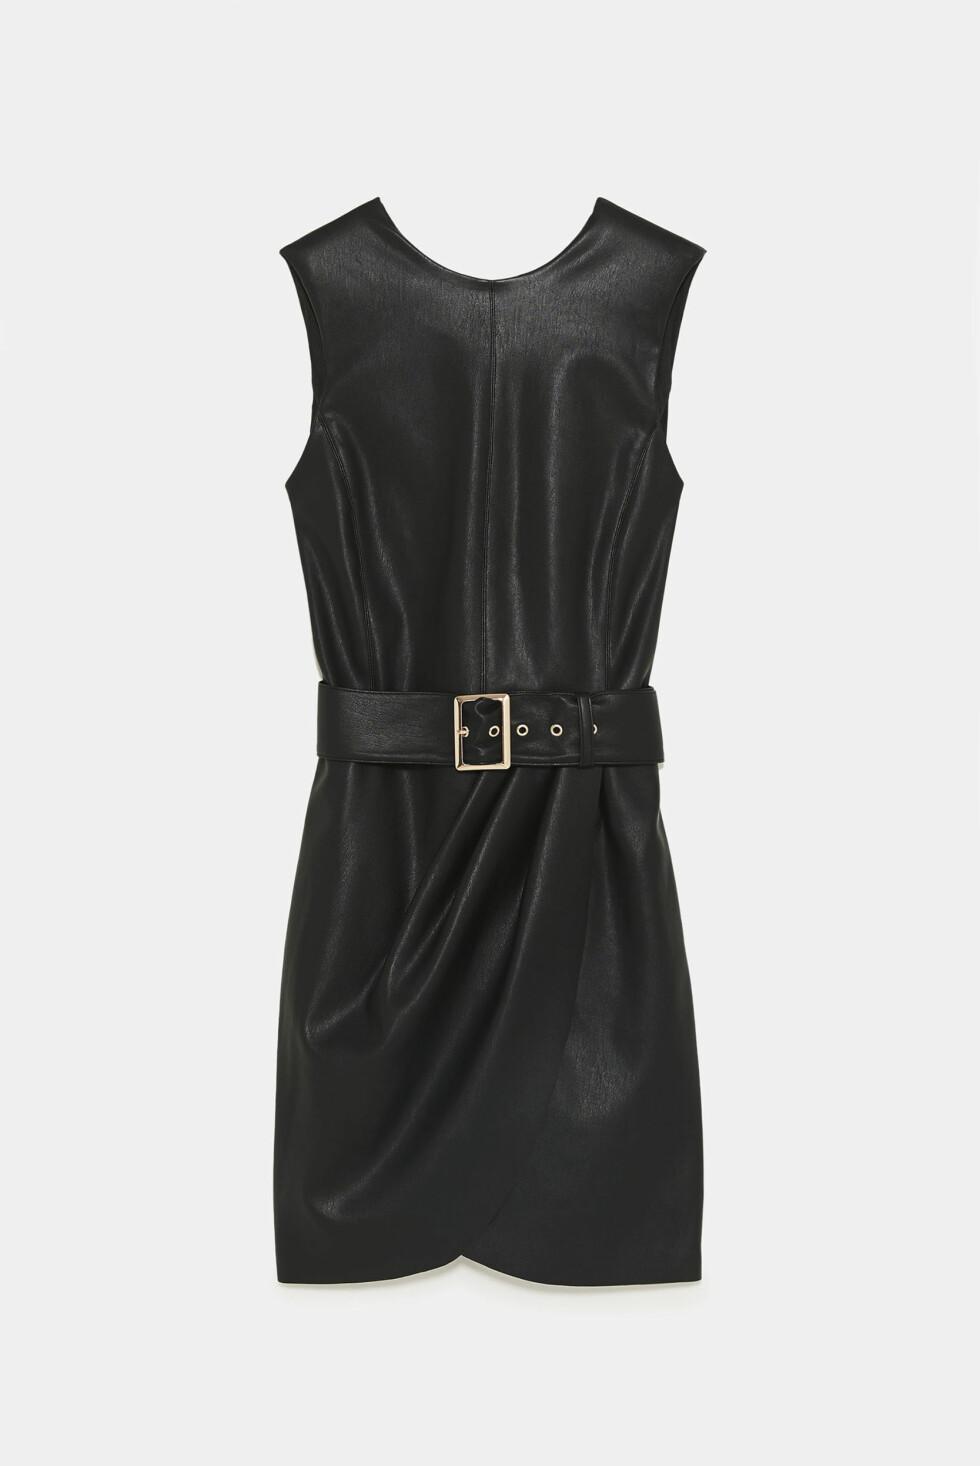 Zara, kr 300